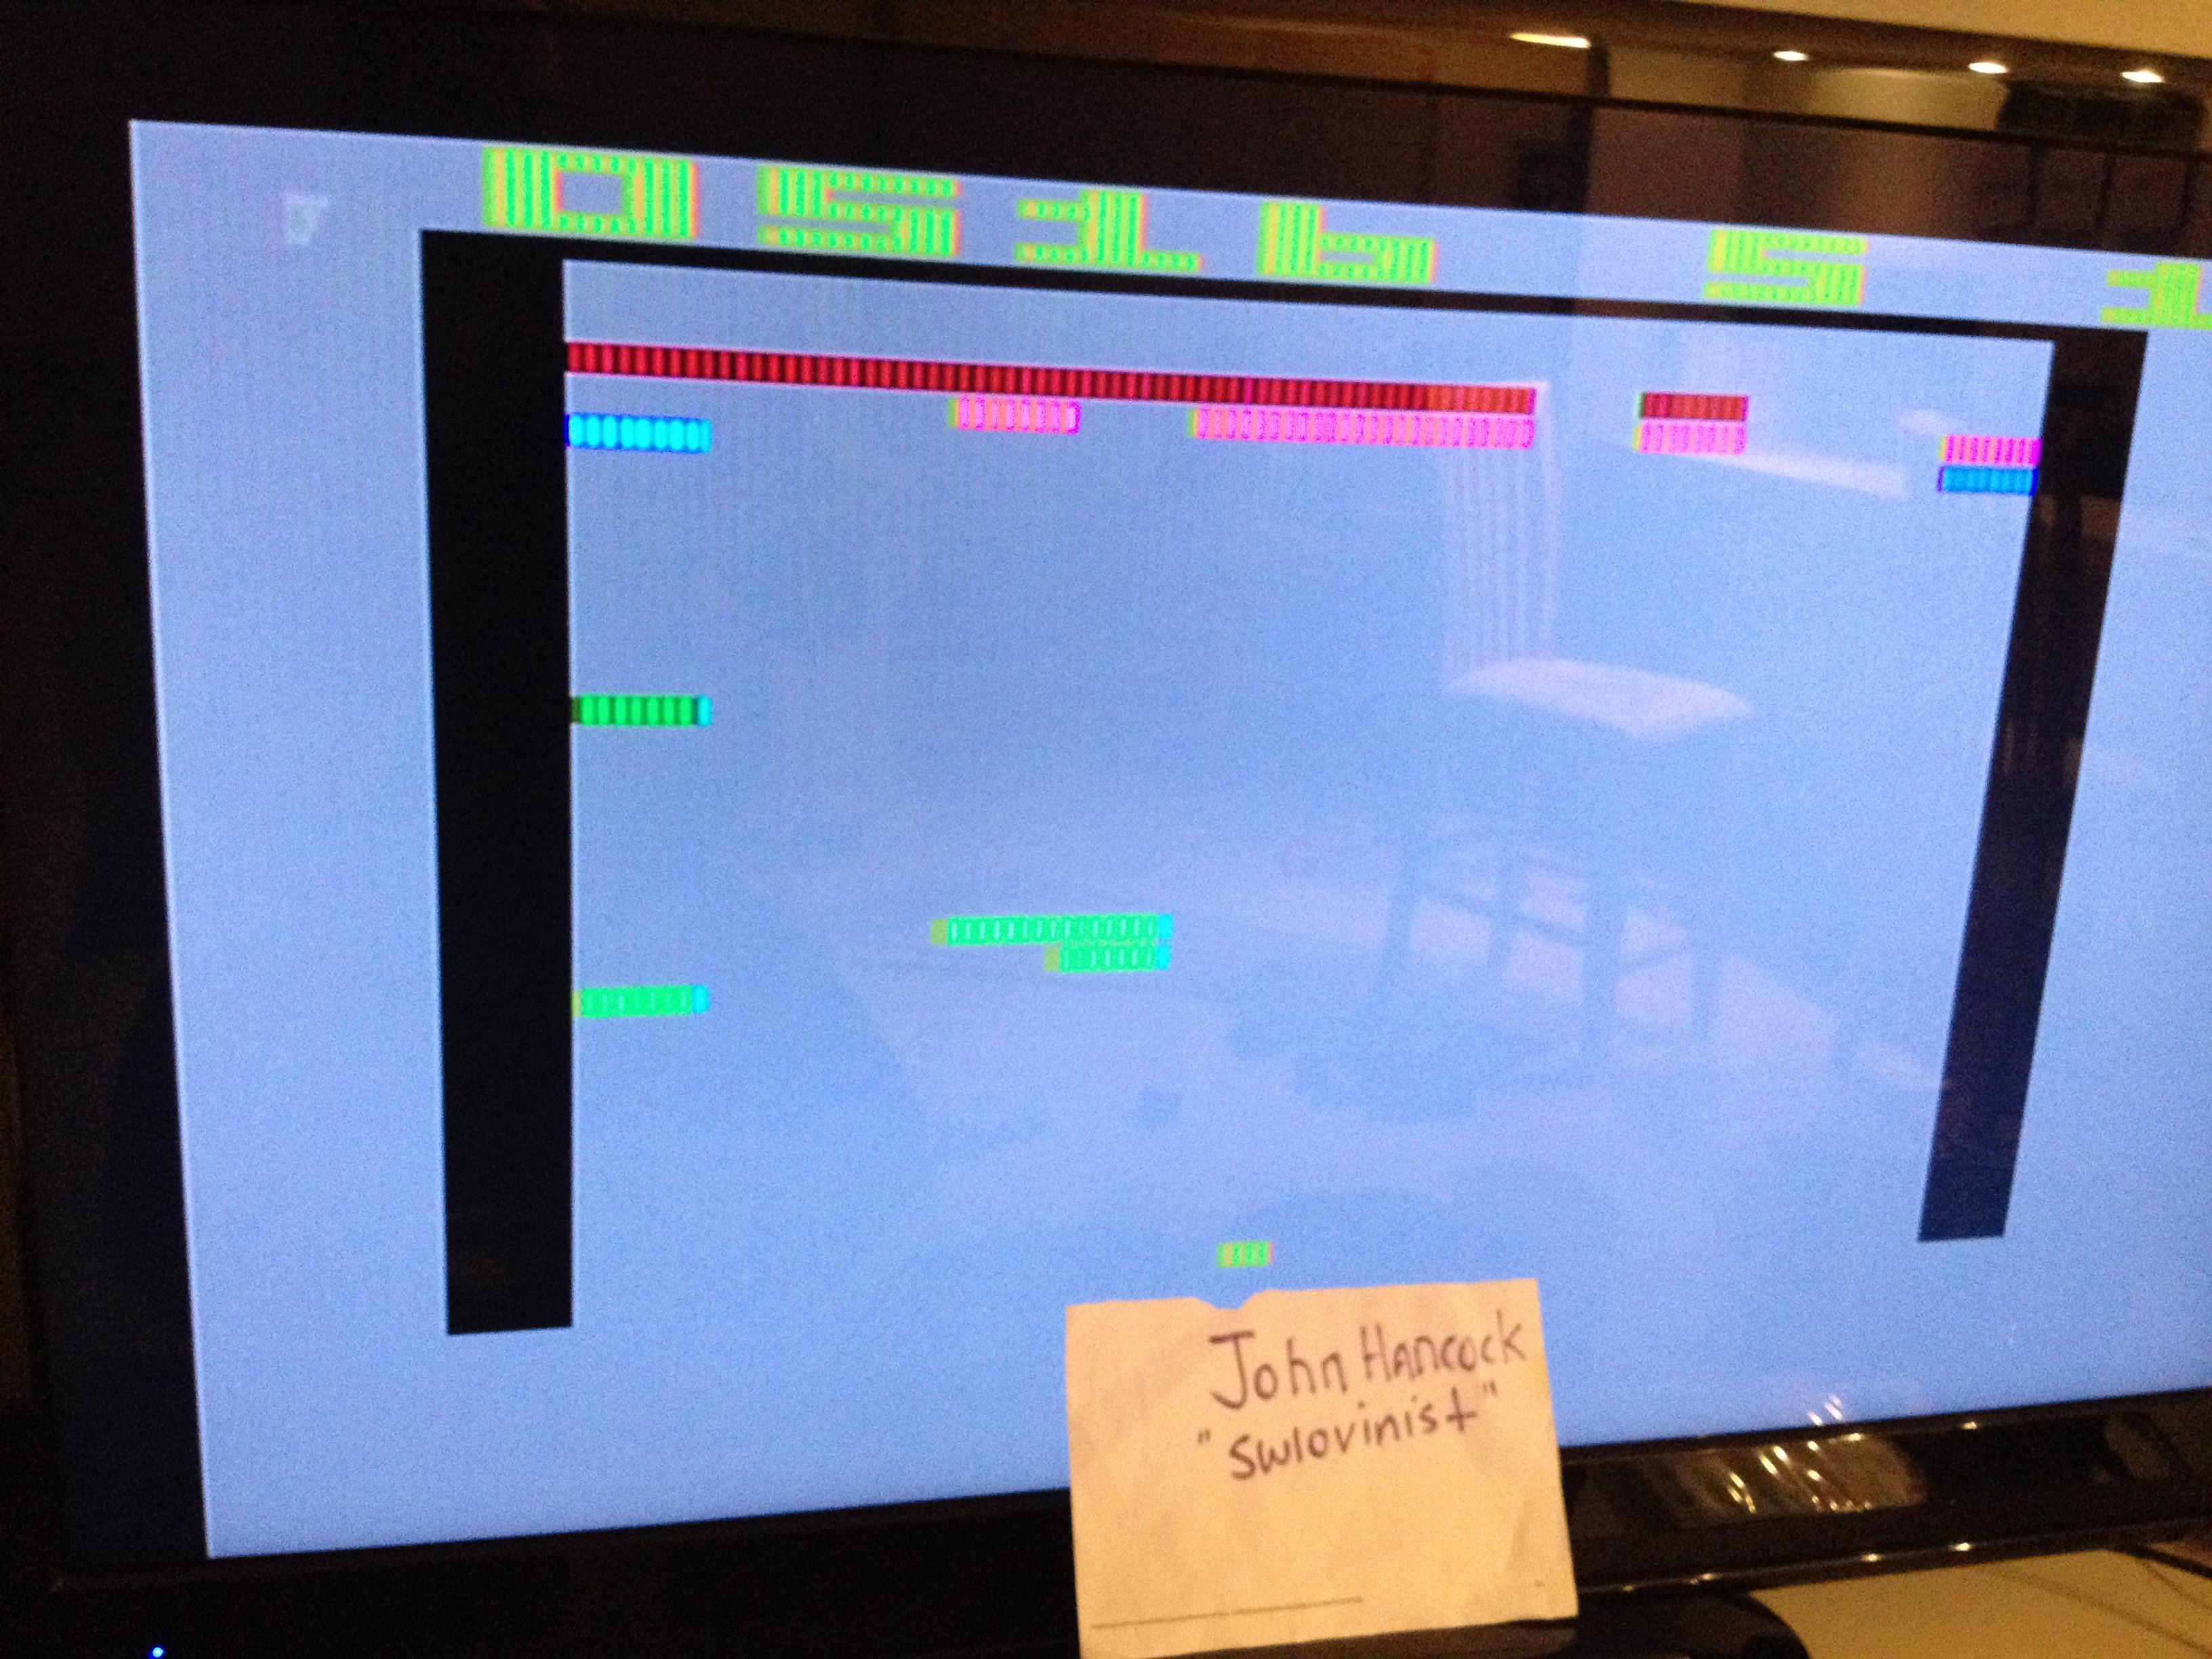 swlovinist: Super Breakout (Atari 2600 Expert/A) 516 points on 2013-10-01 00:56:38